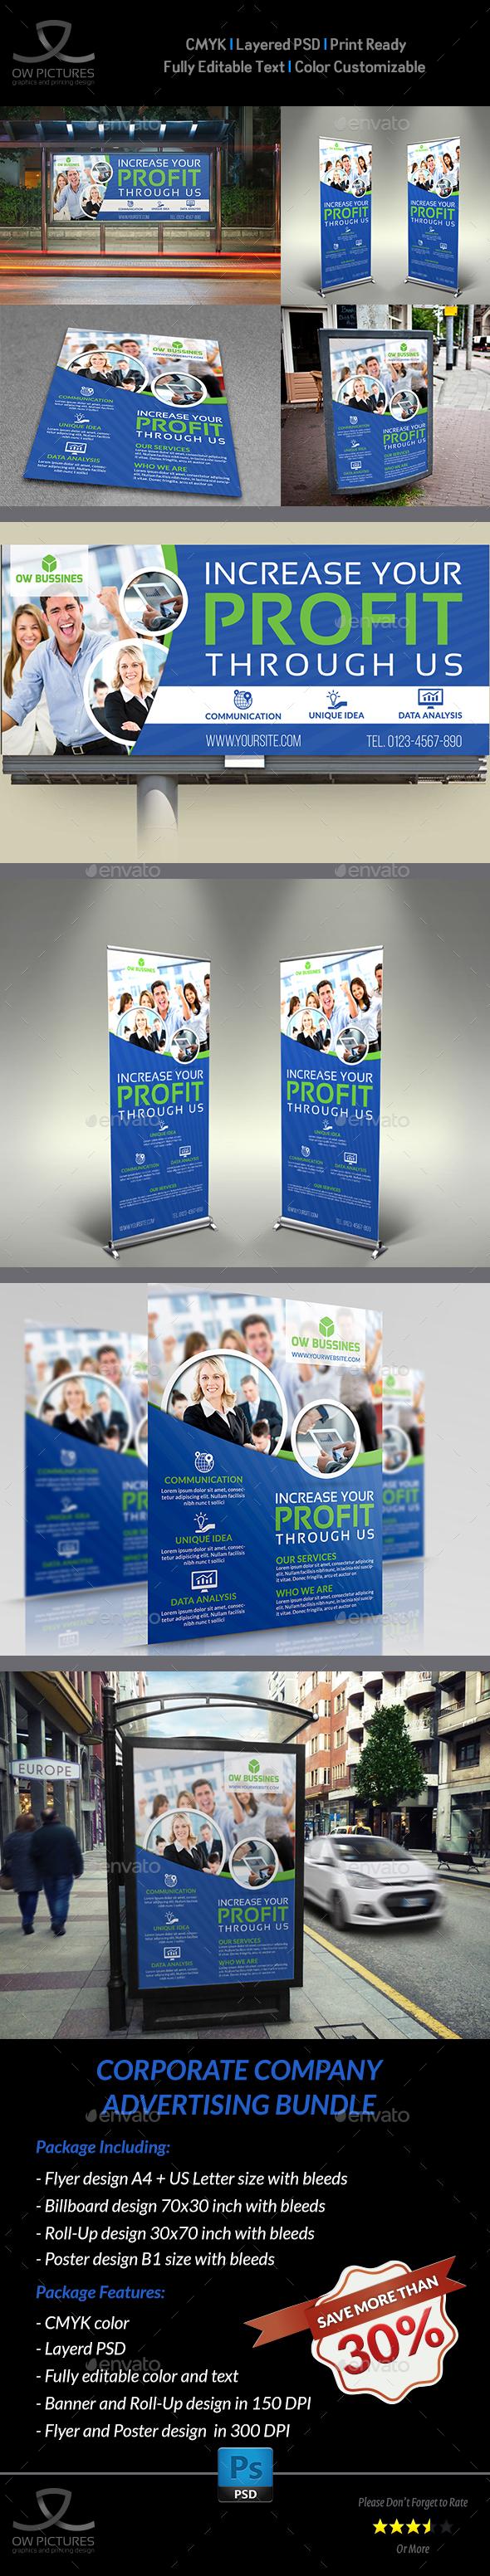 Corporate Company Advertising Bundle Vol.2 - Signage Print Templates